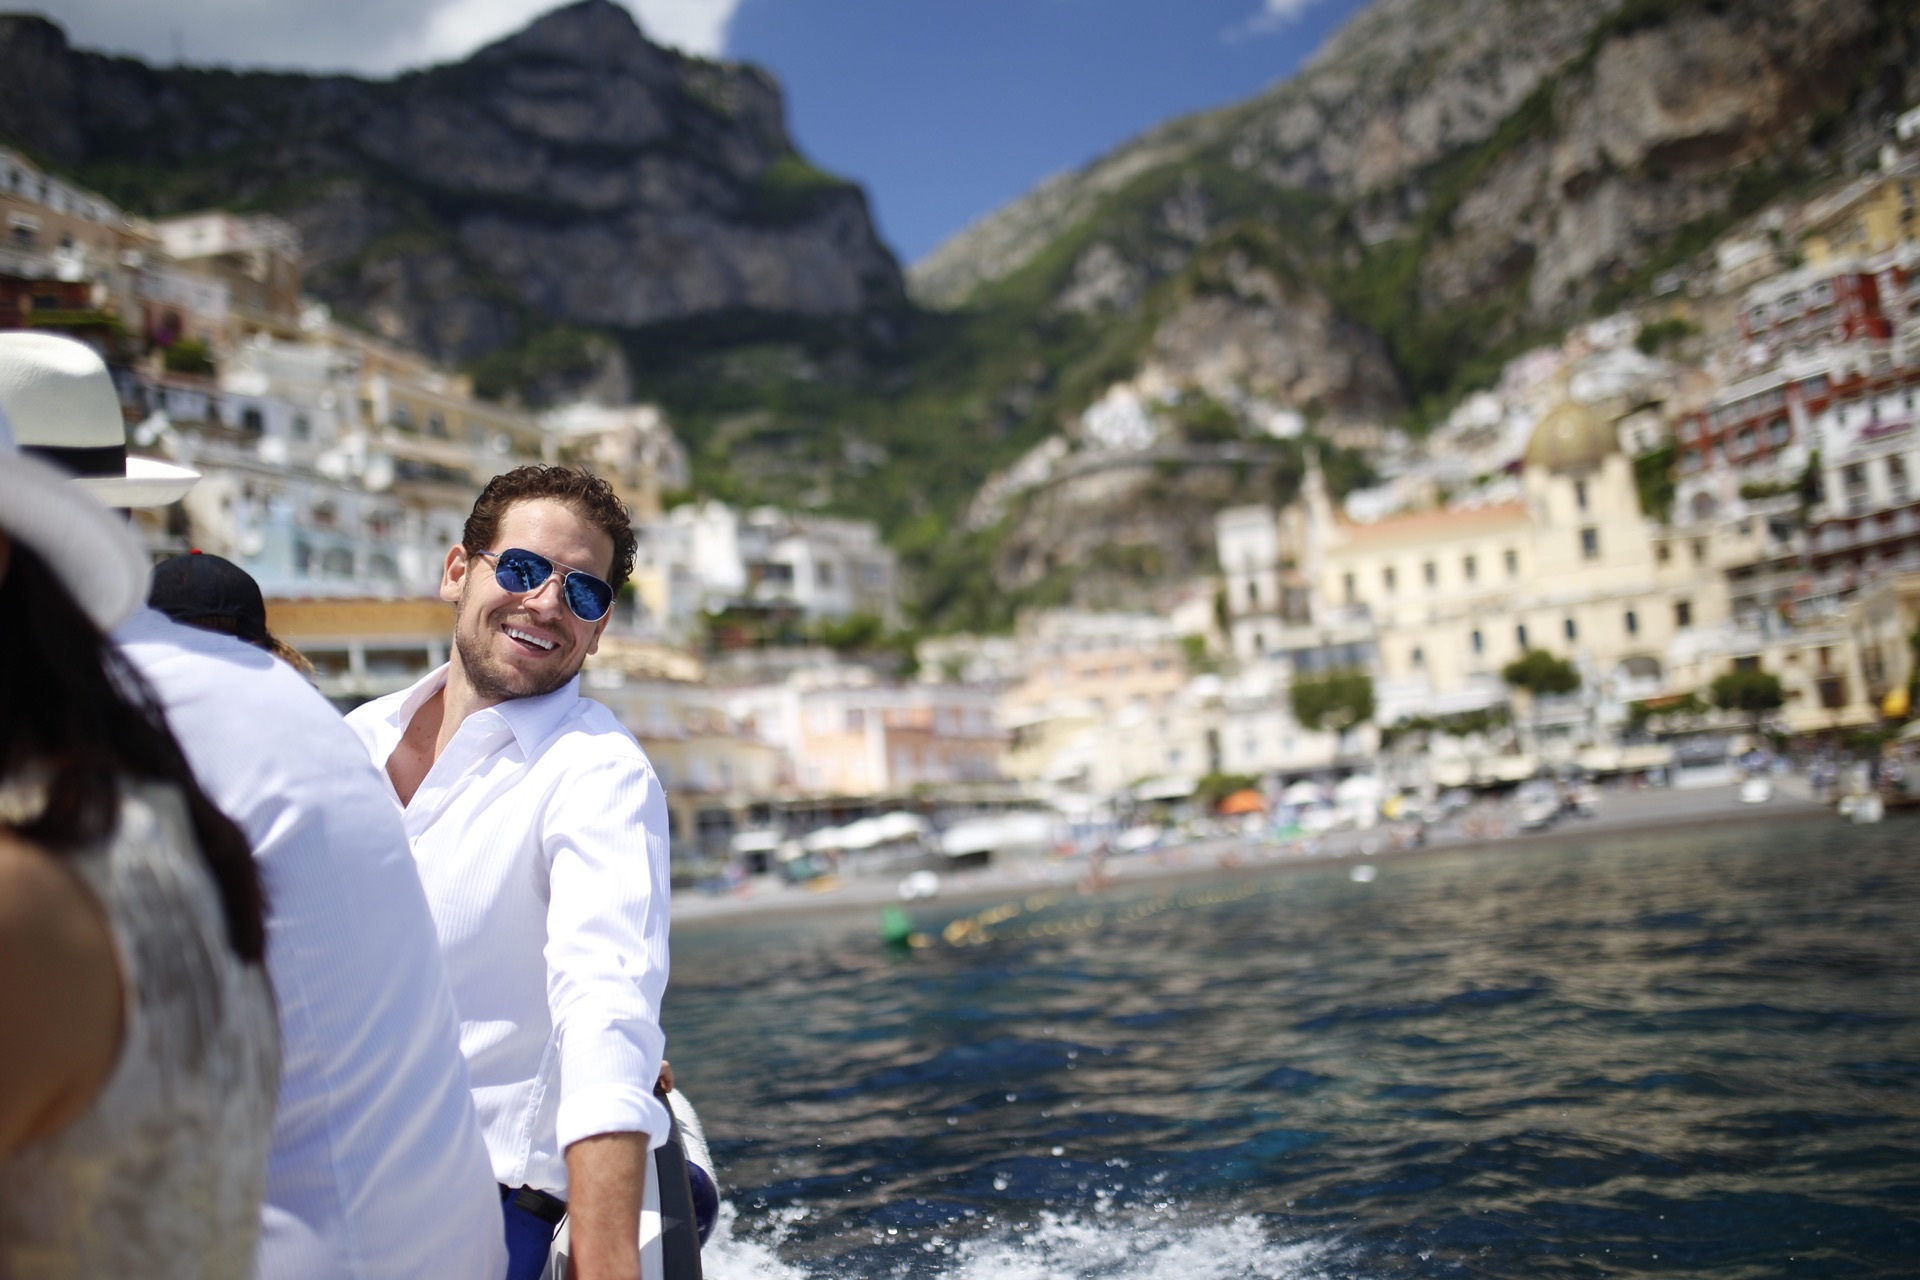 http://www.weddingamalfi.com/wp-content/uploads/Benjamin-on-the-boat-day-2.jpg